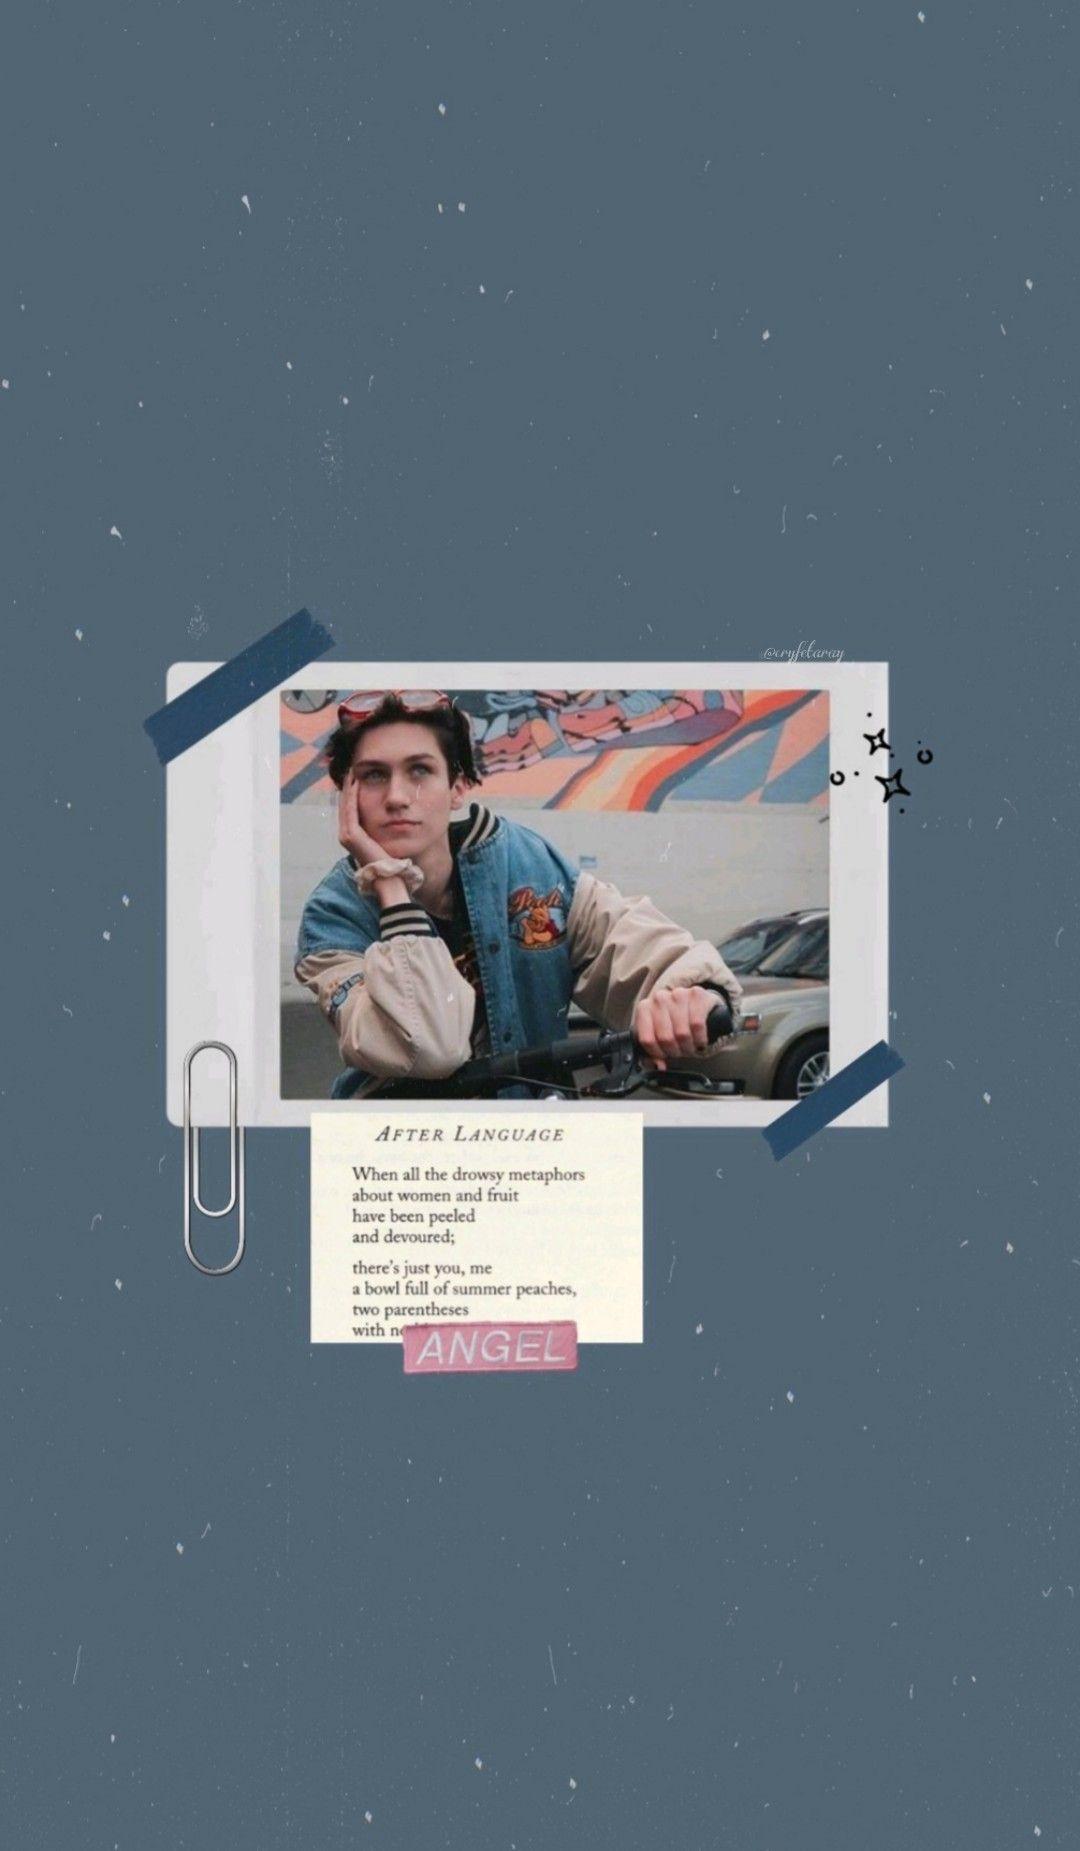 Chasehudson Chase Tiktok Eboy Boys Lilhuddy Cute Locksreen Wallpaper Phone Love In 2020 Boys Wallpaper Cute Wallpapers Hudson